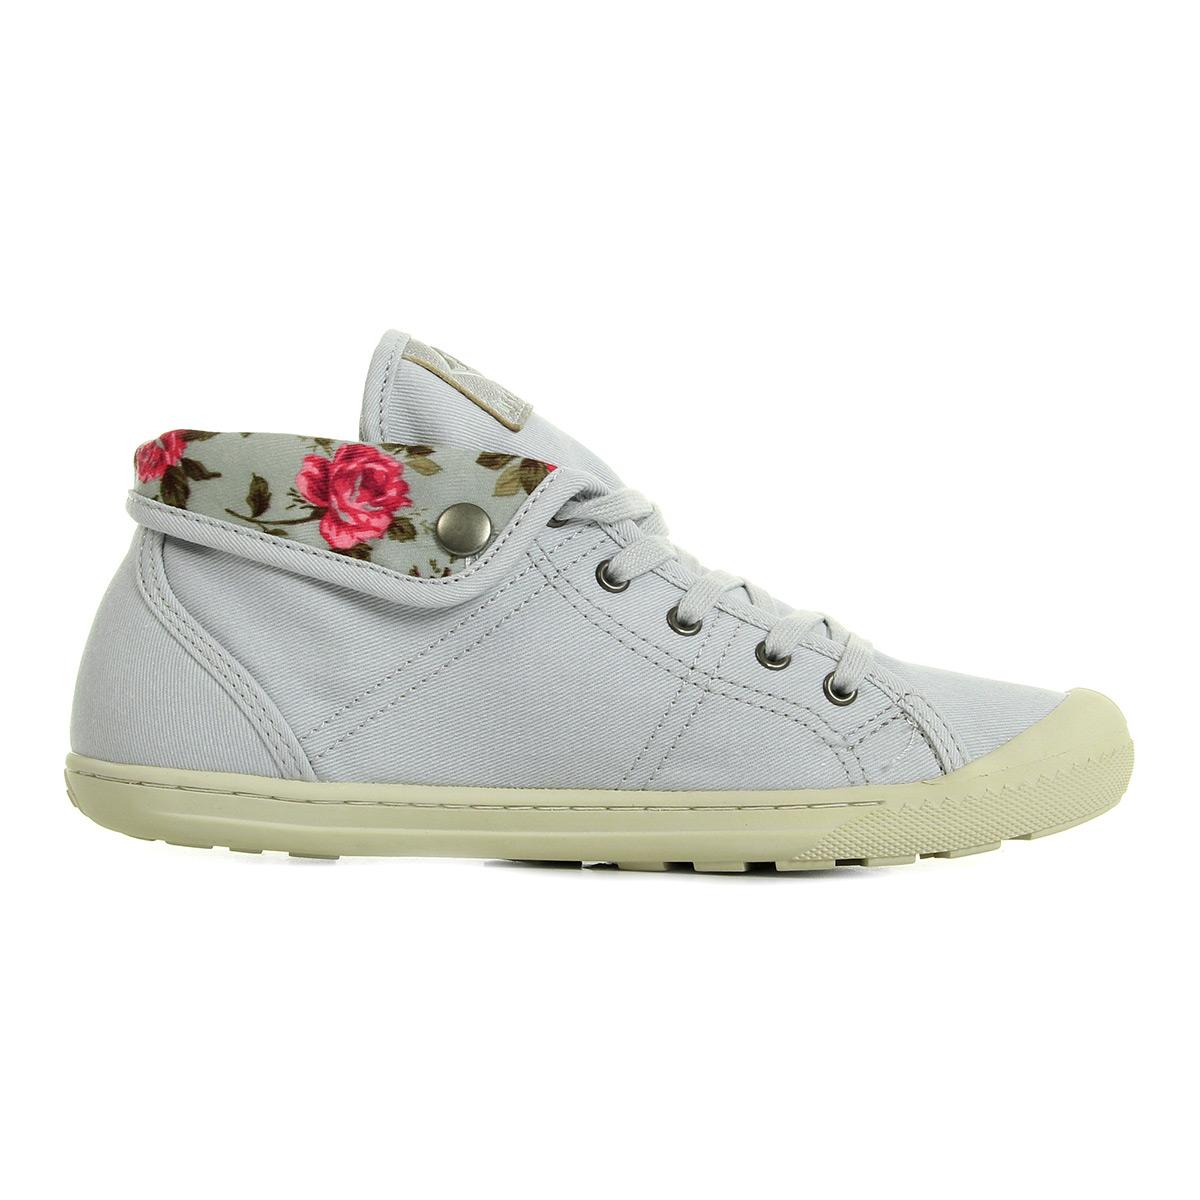 Palladium PLDM Letty Twl Lunar/ Flower 73778549, Baskets mode femme